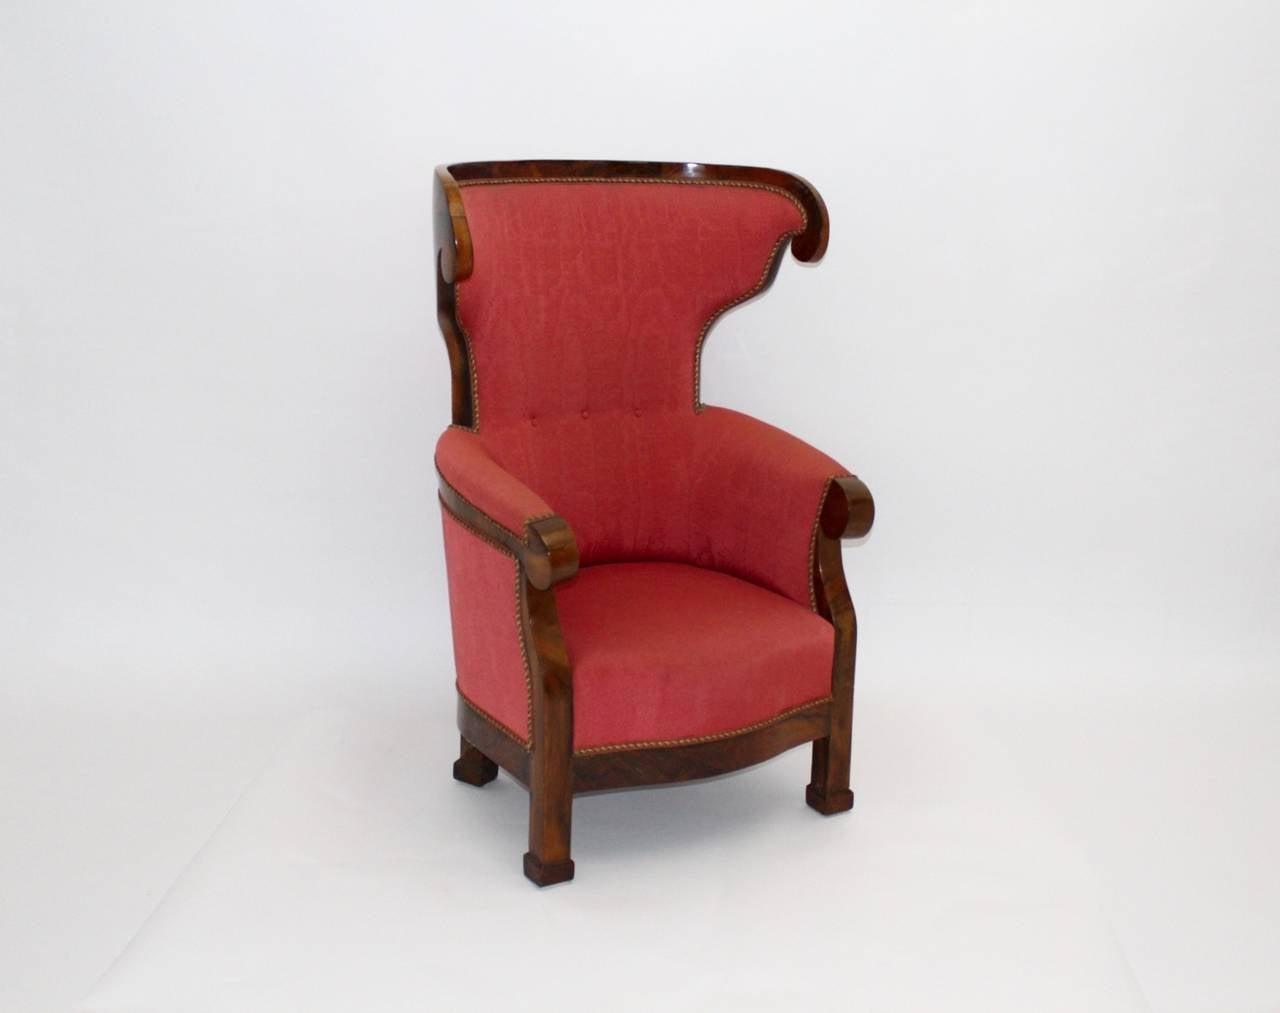 Austrian Biedermeier Walnut Wood Pink Fabric Wingback Chair circa 1825 Vienna For Sale